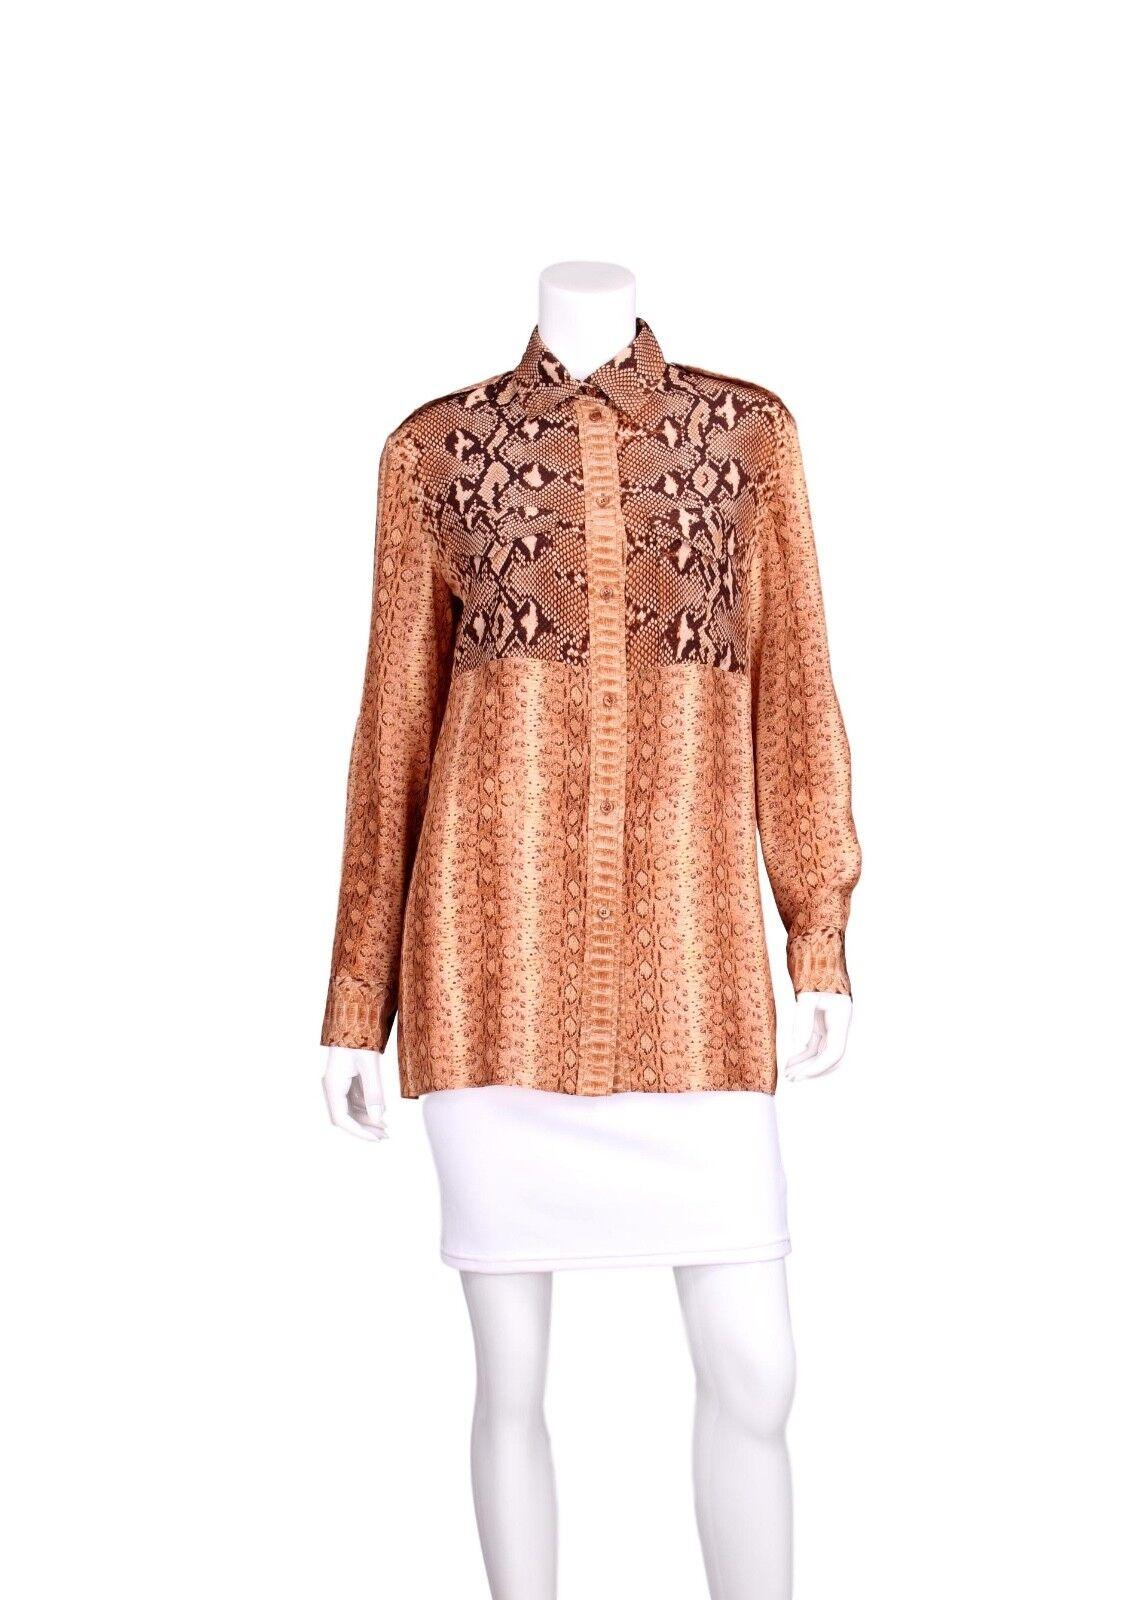 CHLOE Brown & orange Snakeprint Patchwork Long Sleeve Button Up Silk Top - US 8